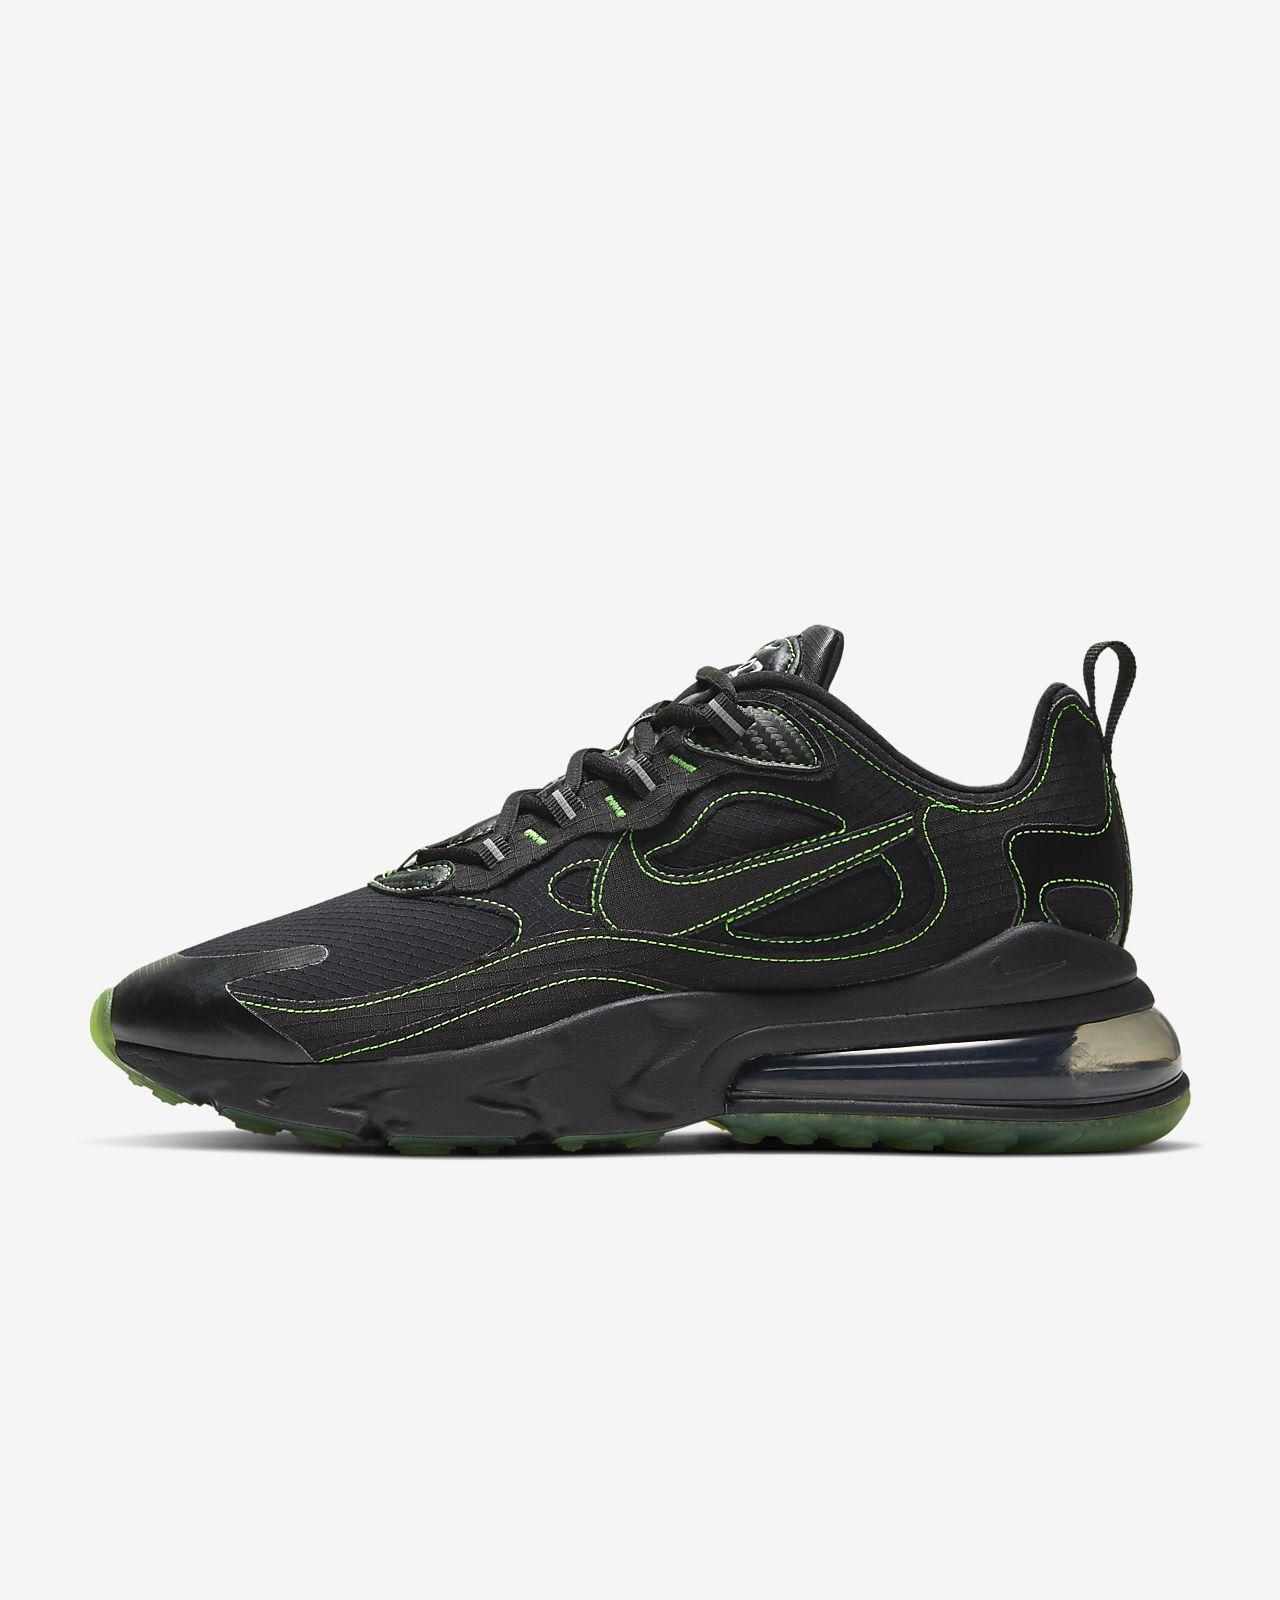 Nike Air Max 97 Limited Edition | Ropa nike, Zapatillas nike